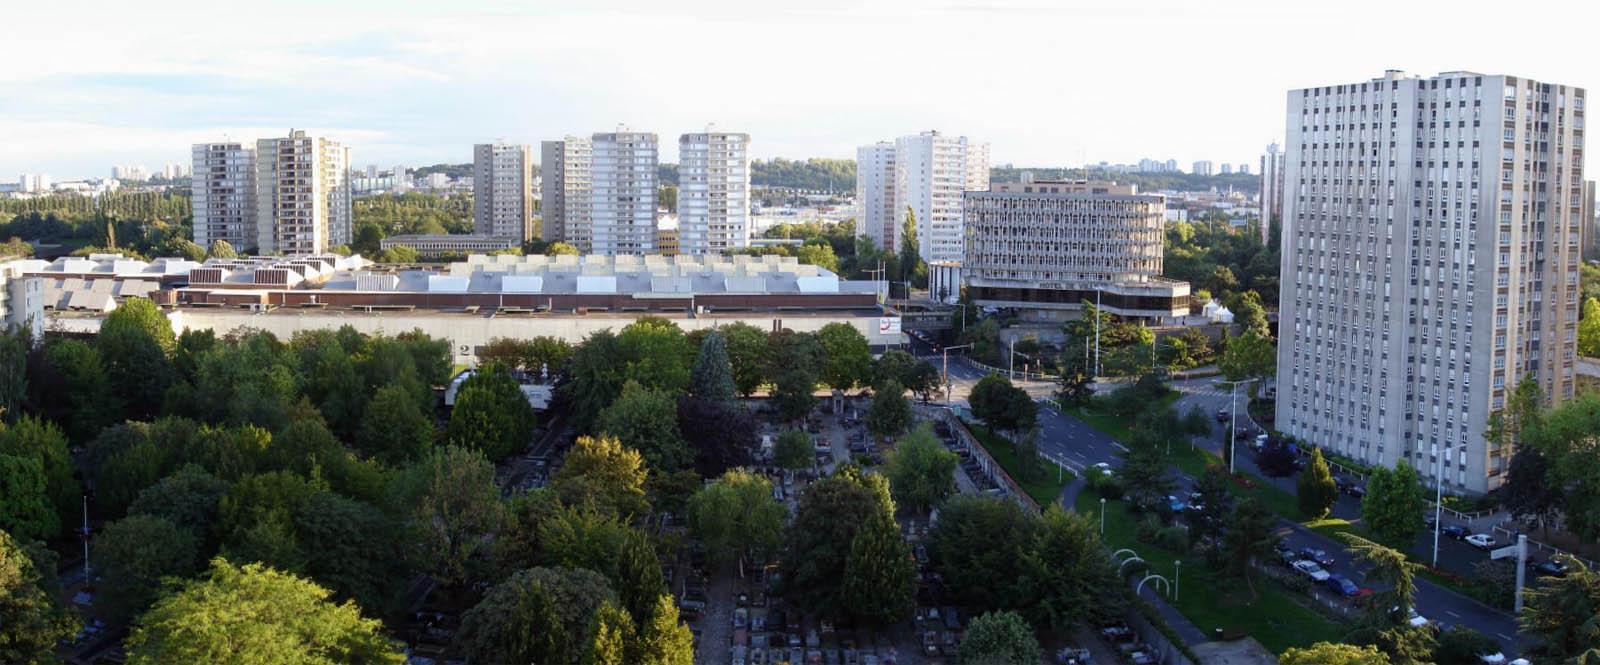 Bobigny (France)